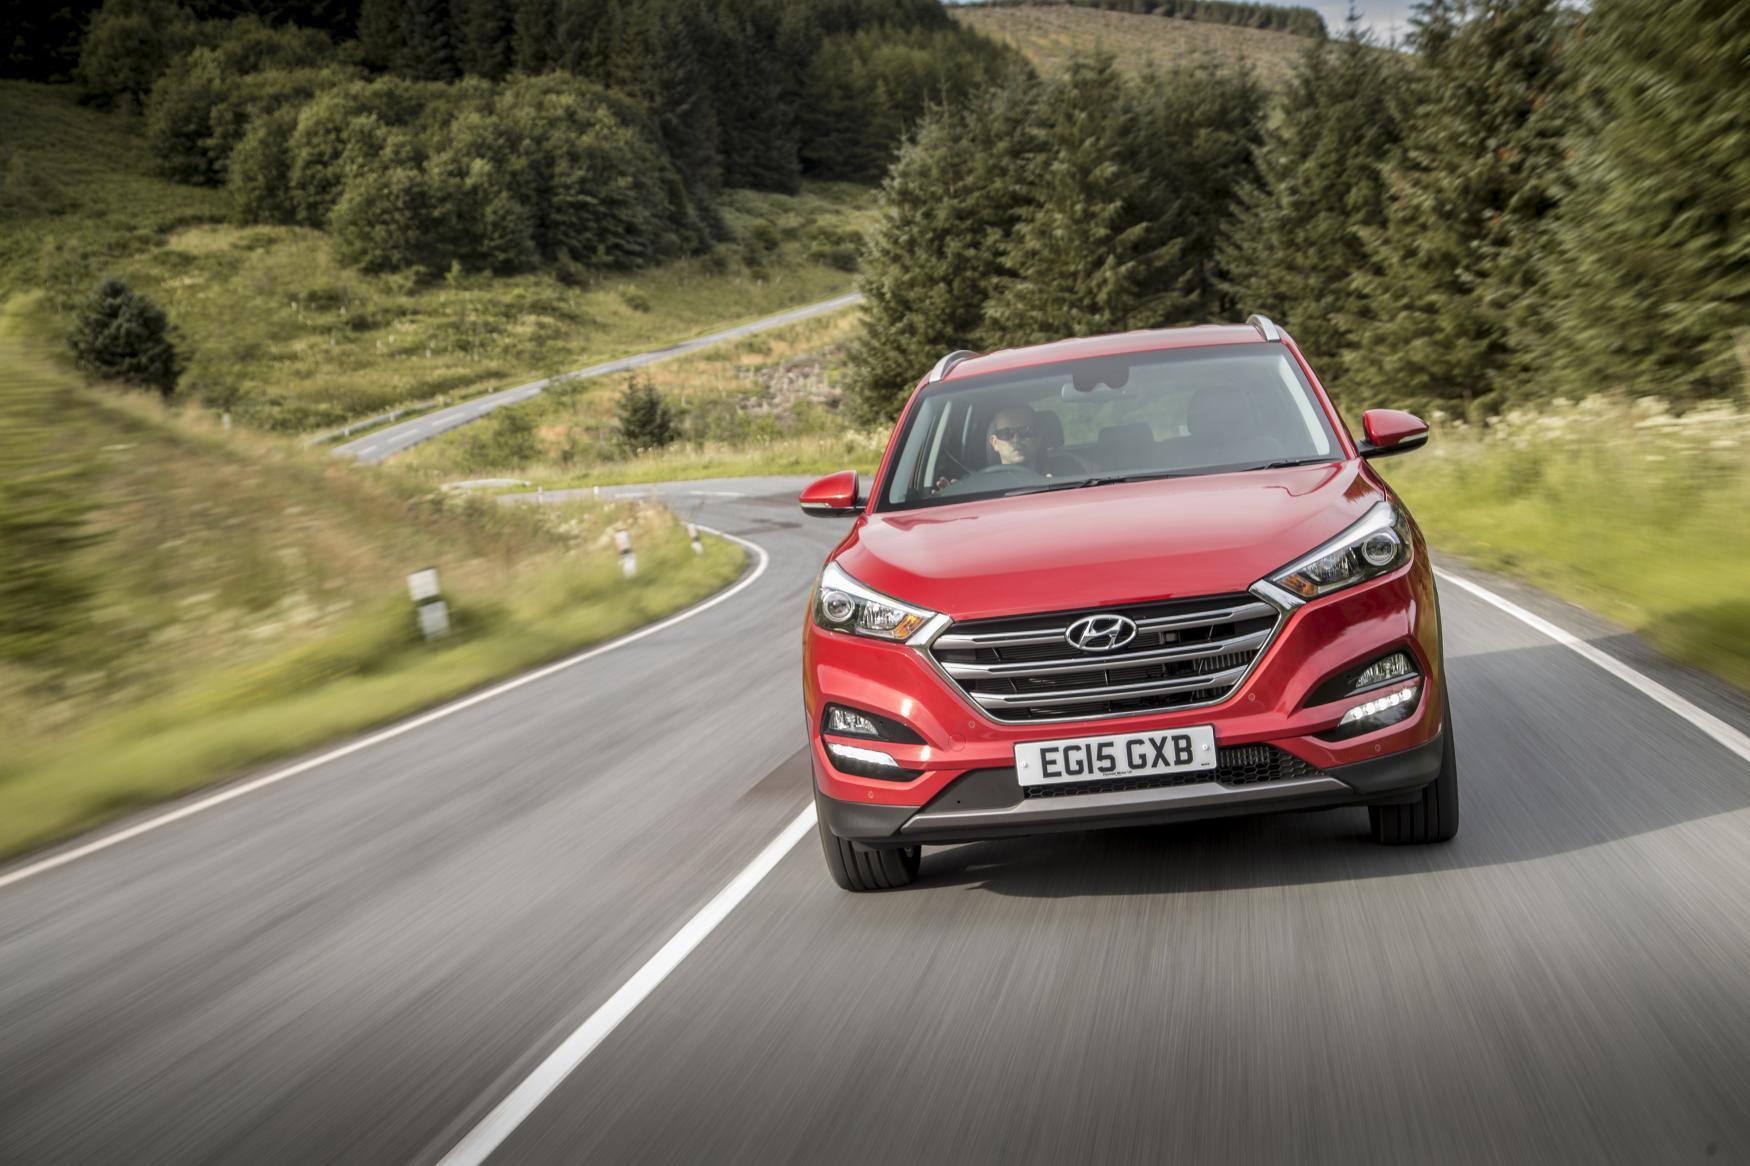 All-New Hyundai Tucson wins Best Family Car 2015 at Recombu awards